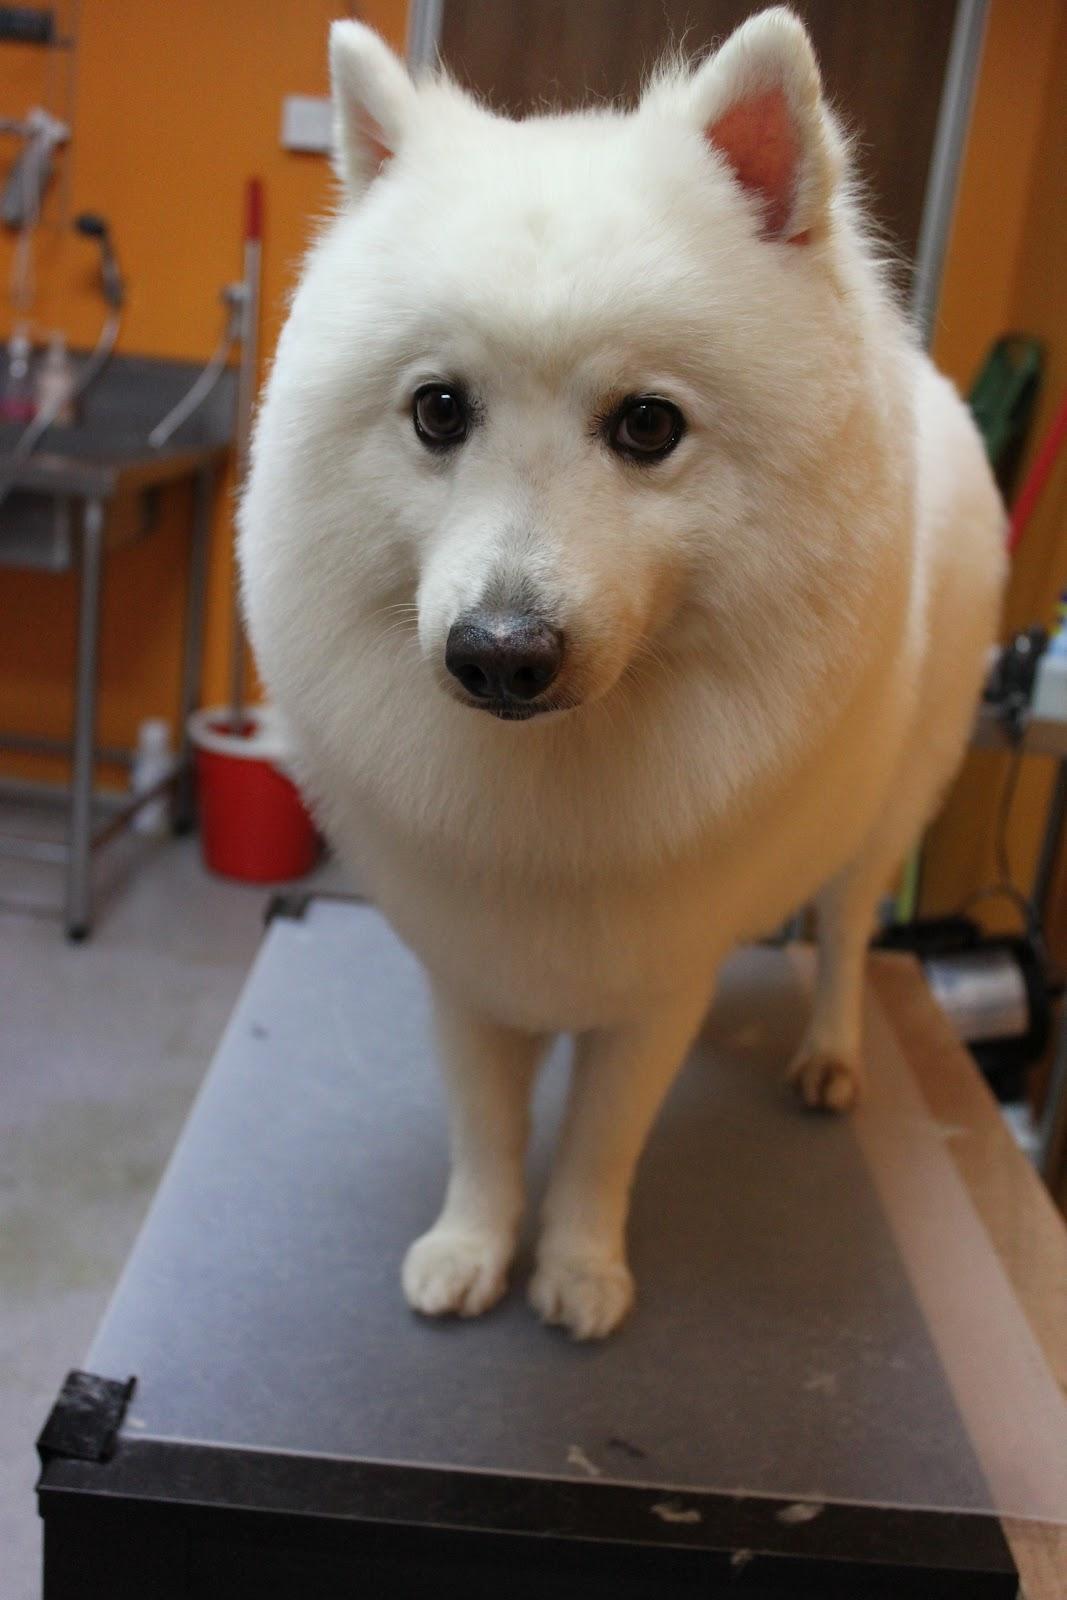 Photo Of The Entire Plant Of Dog Fennel Eupatorium: Japanese Spitz With Beautiful Eyes